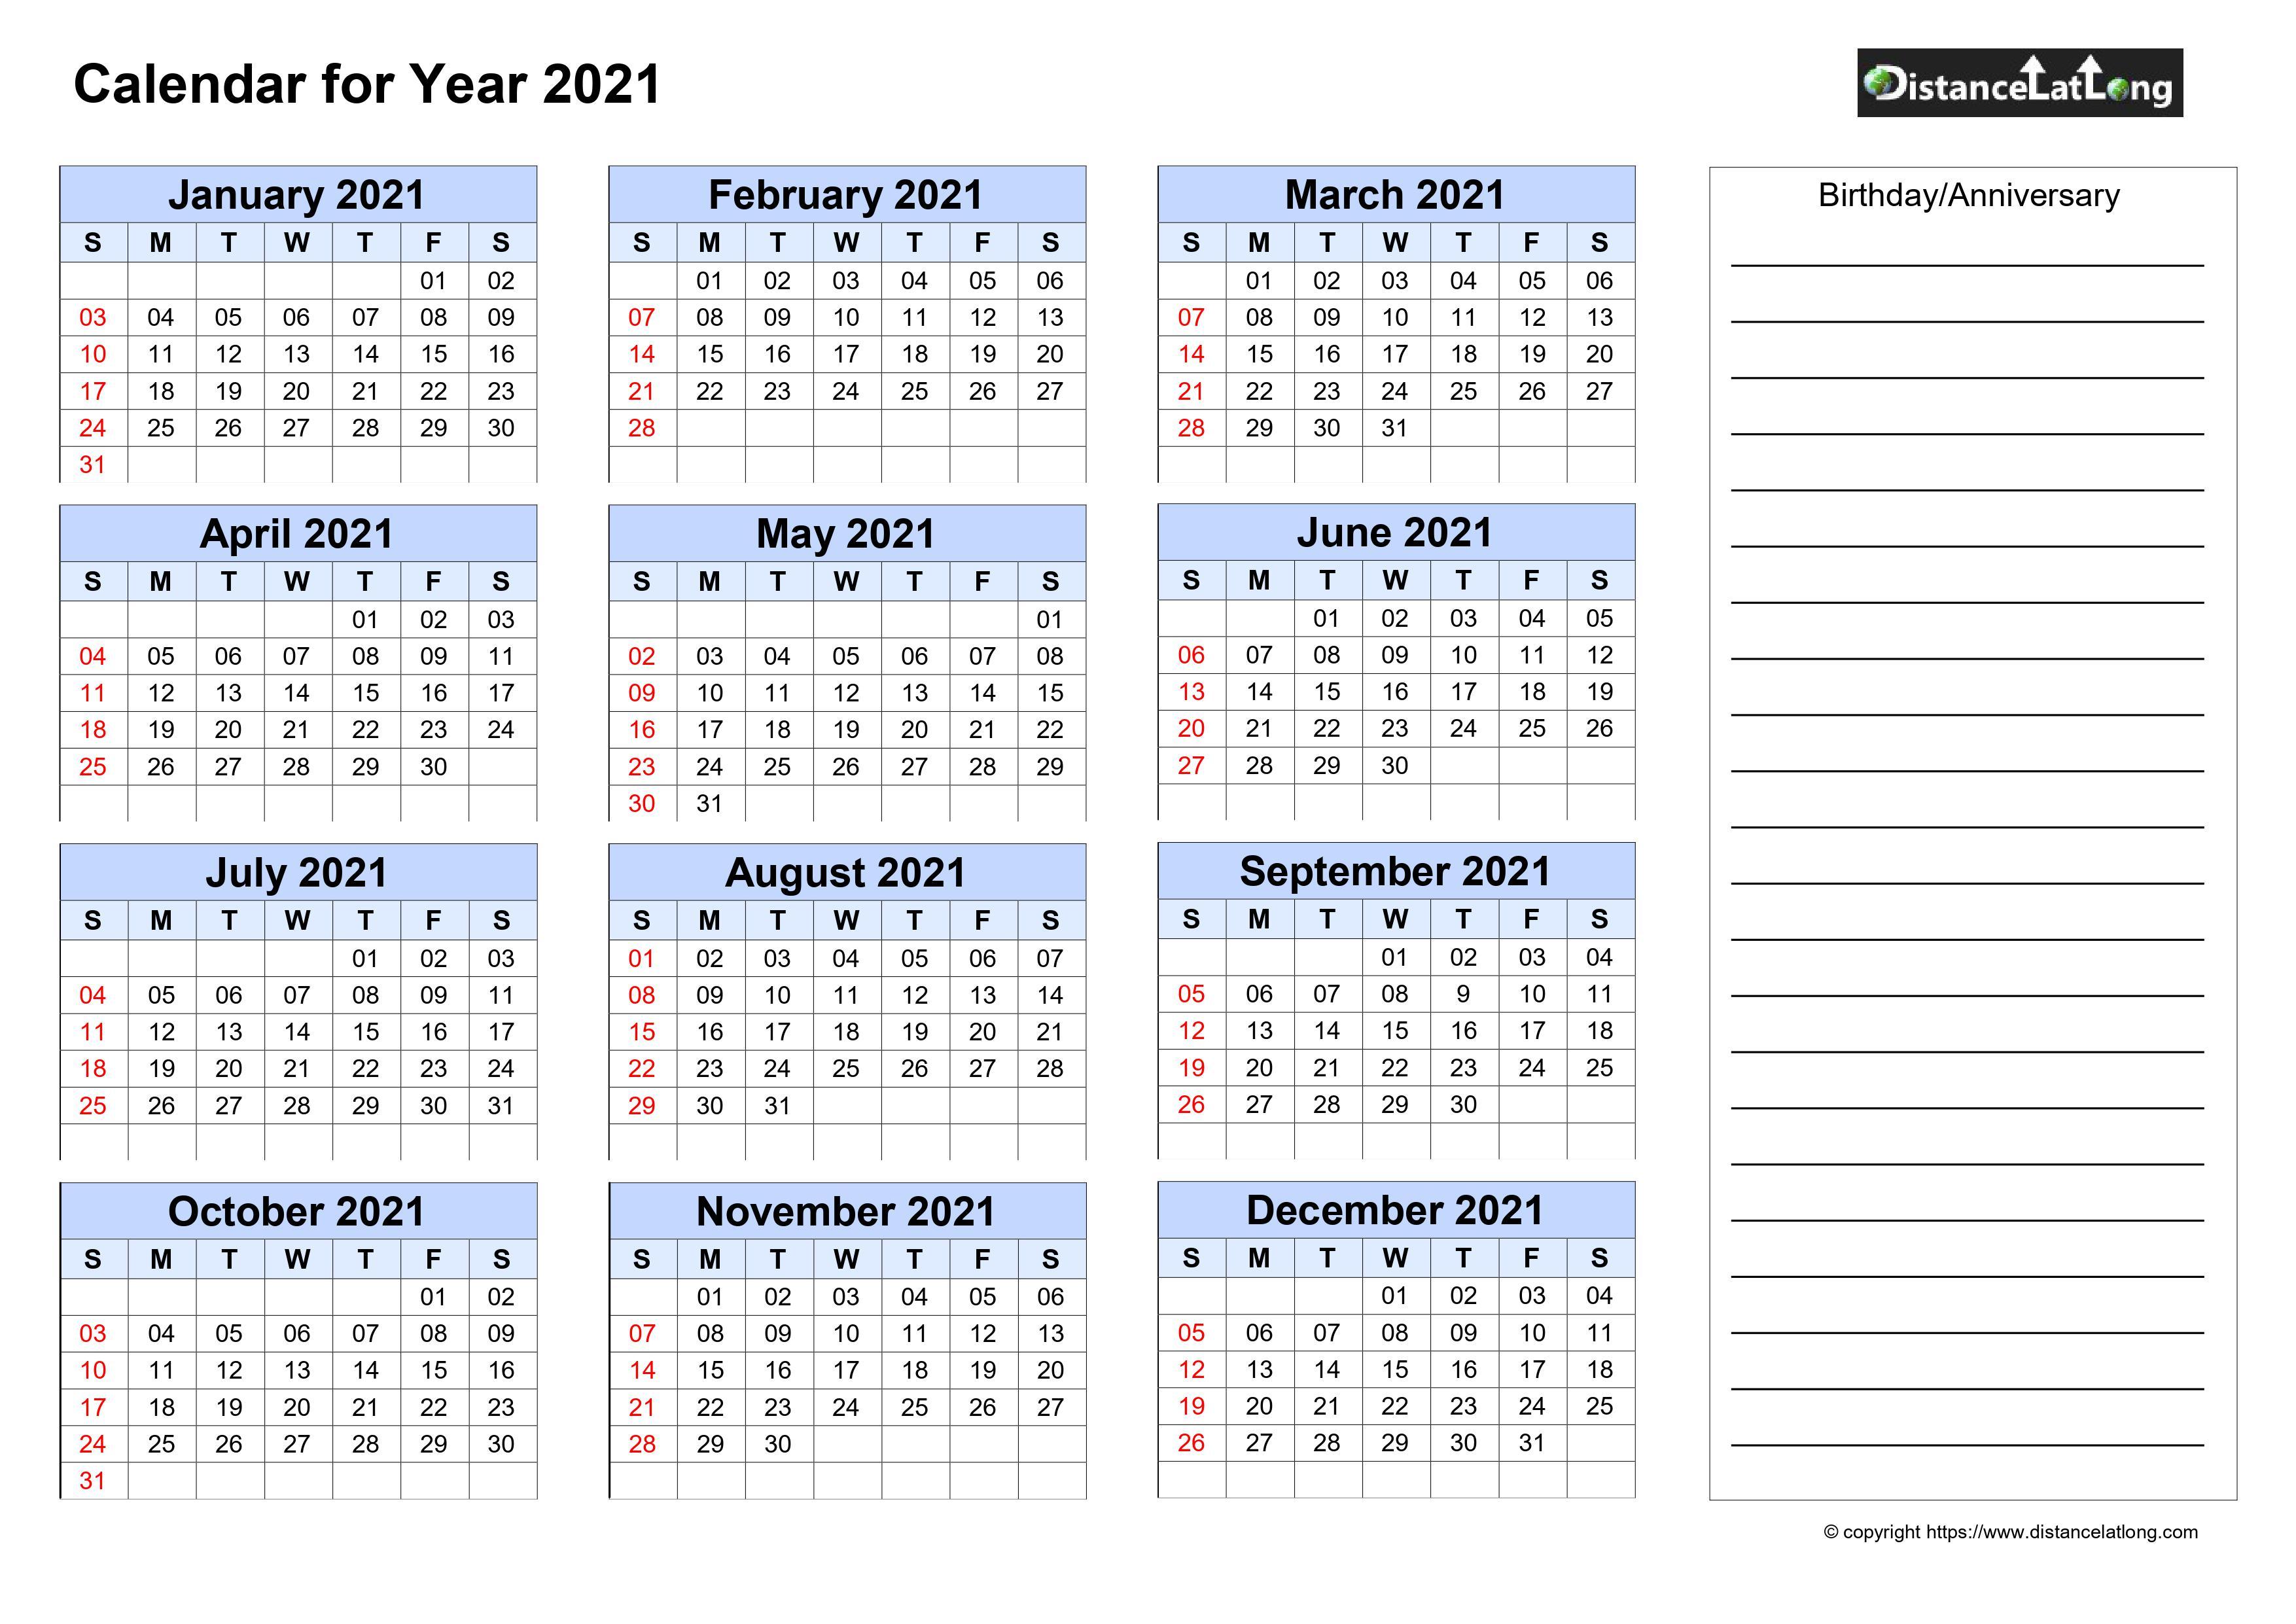 Free Yearly Printable Birthday and Anniversary Blank ...